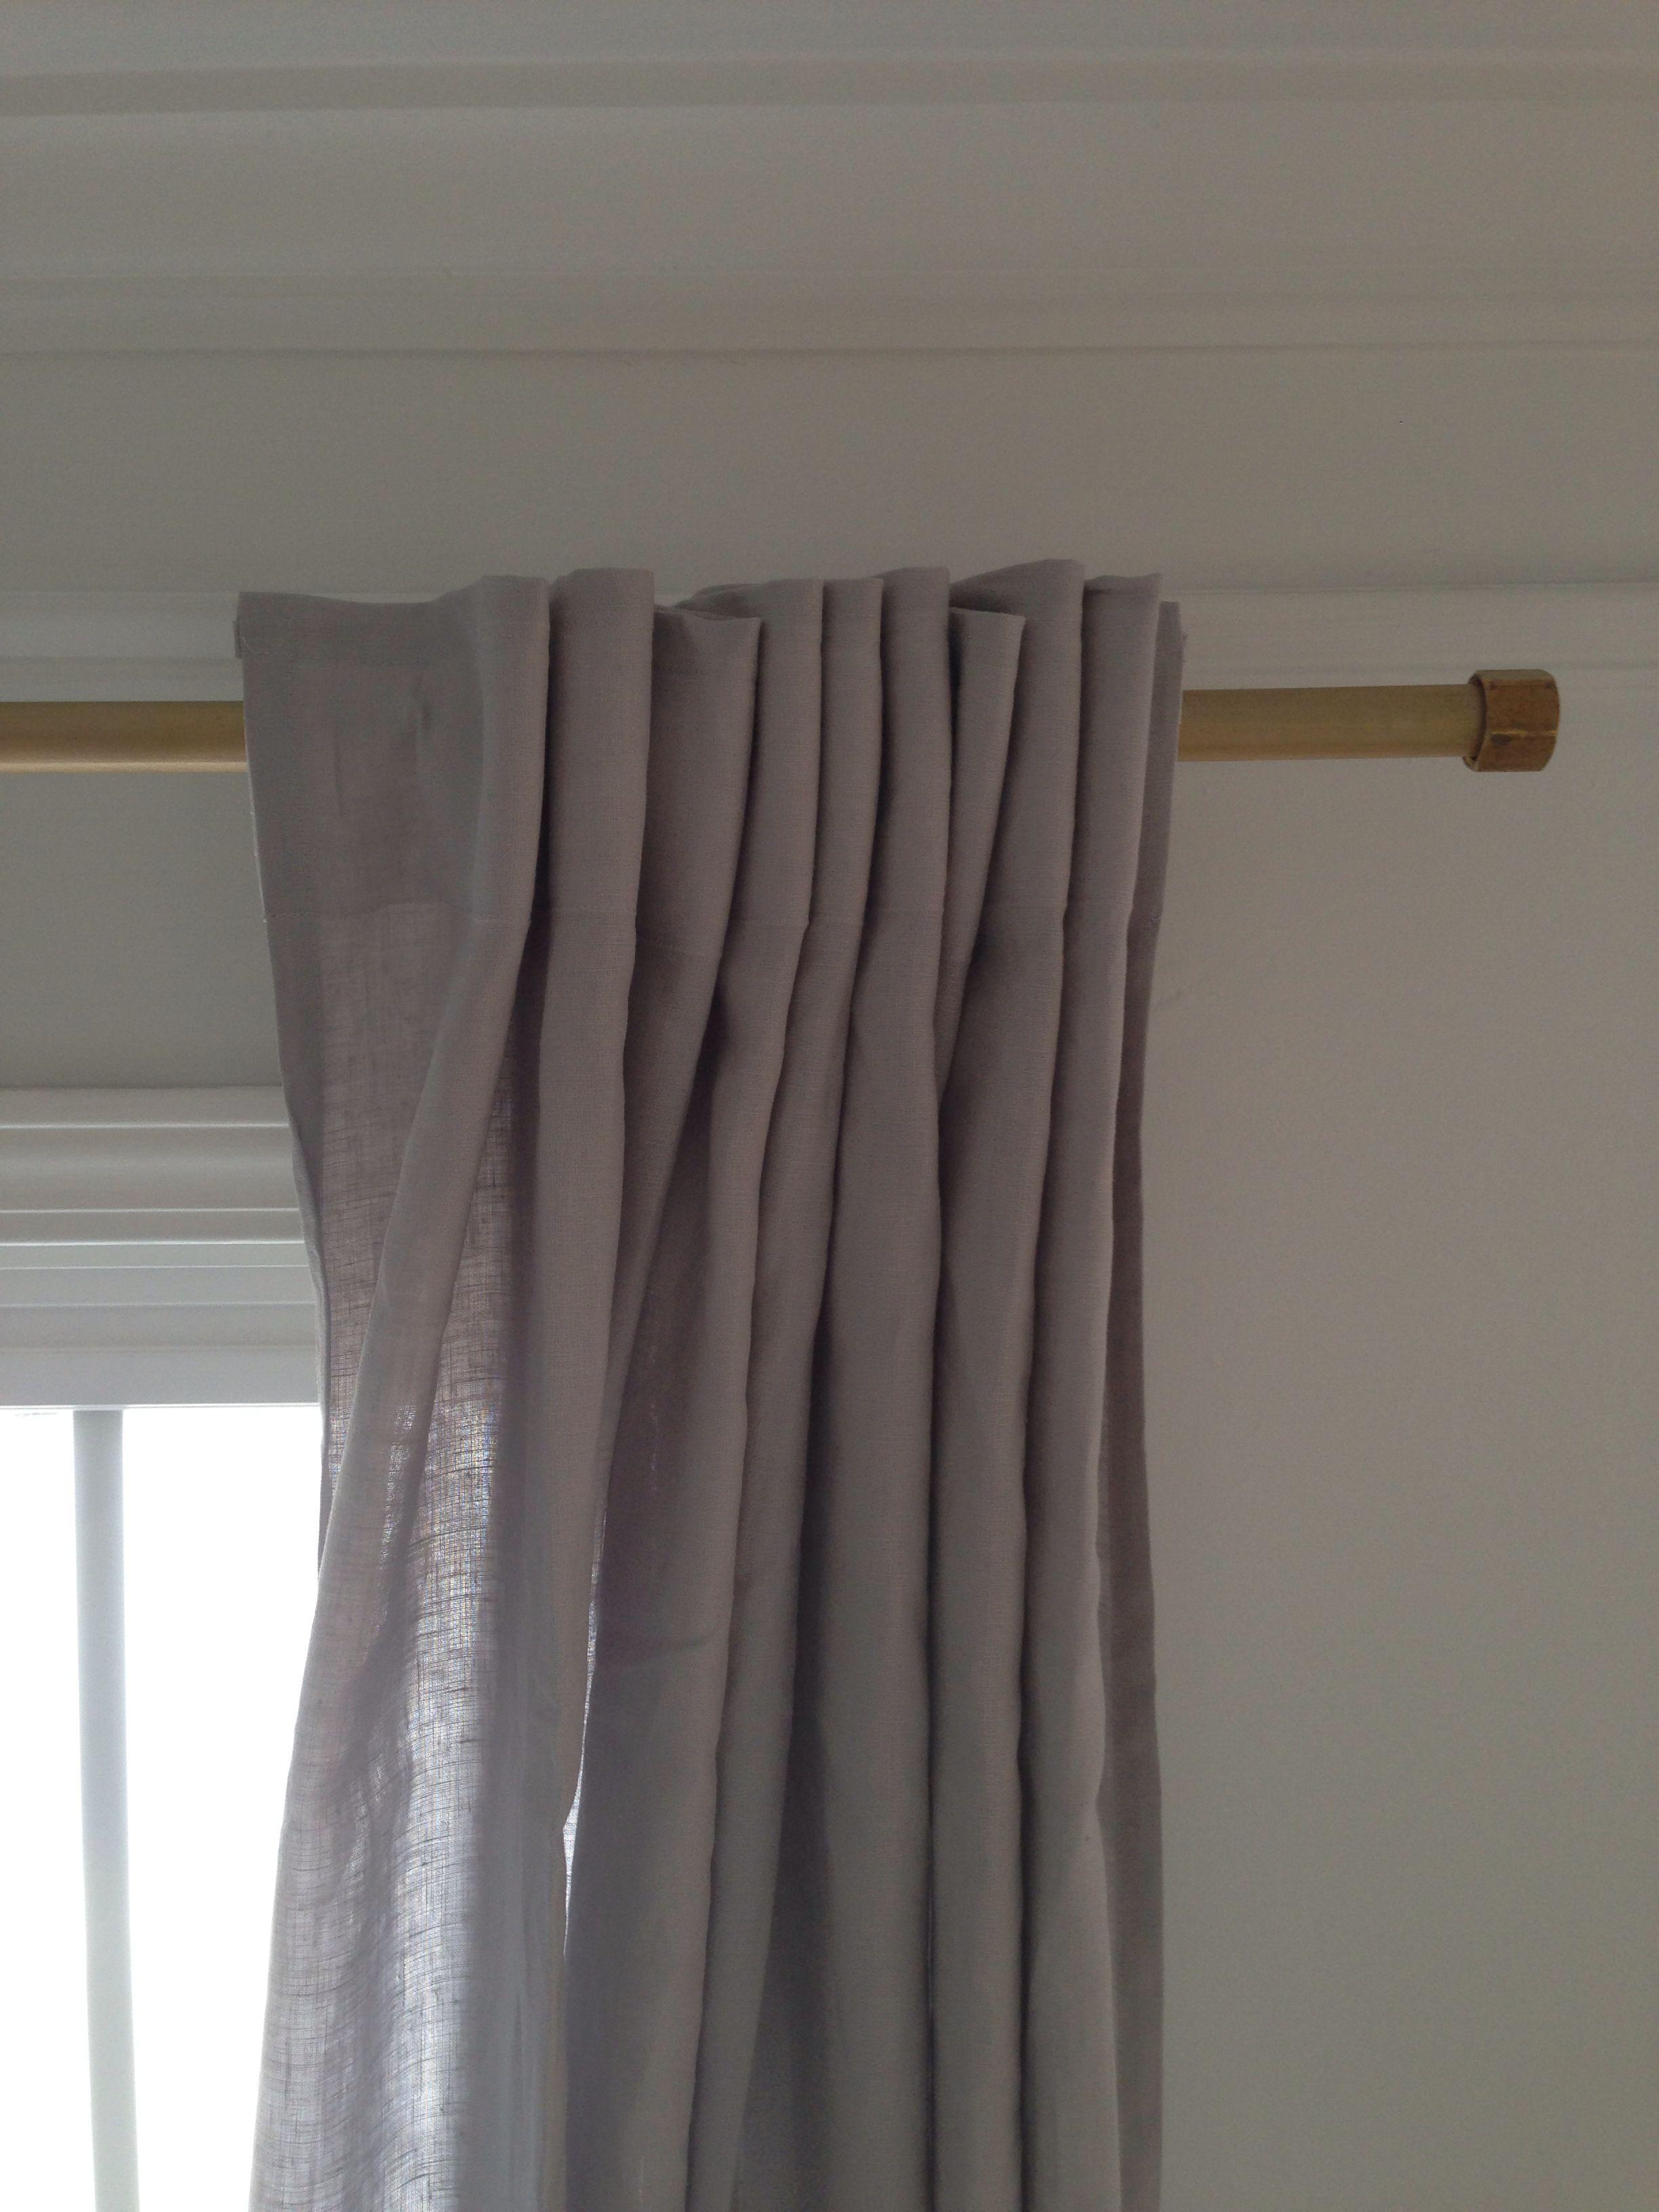 Diy curtain rods crafty ideas pinterest